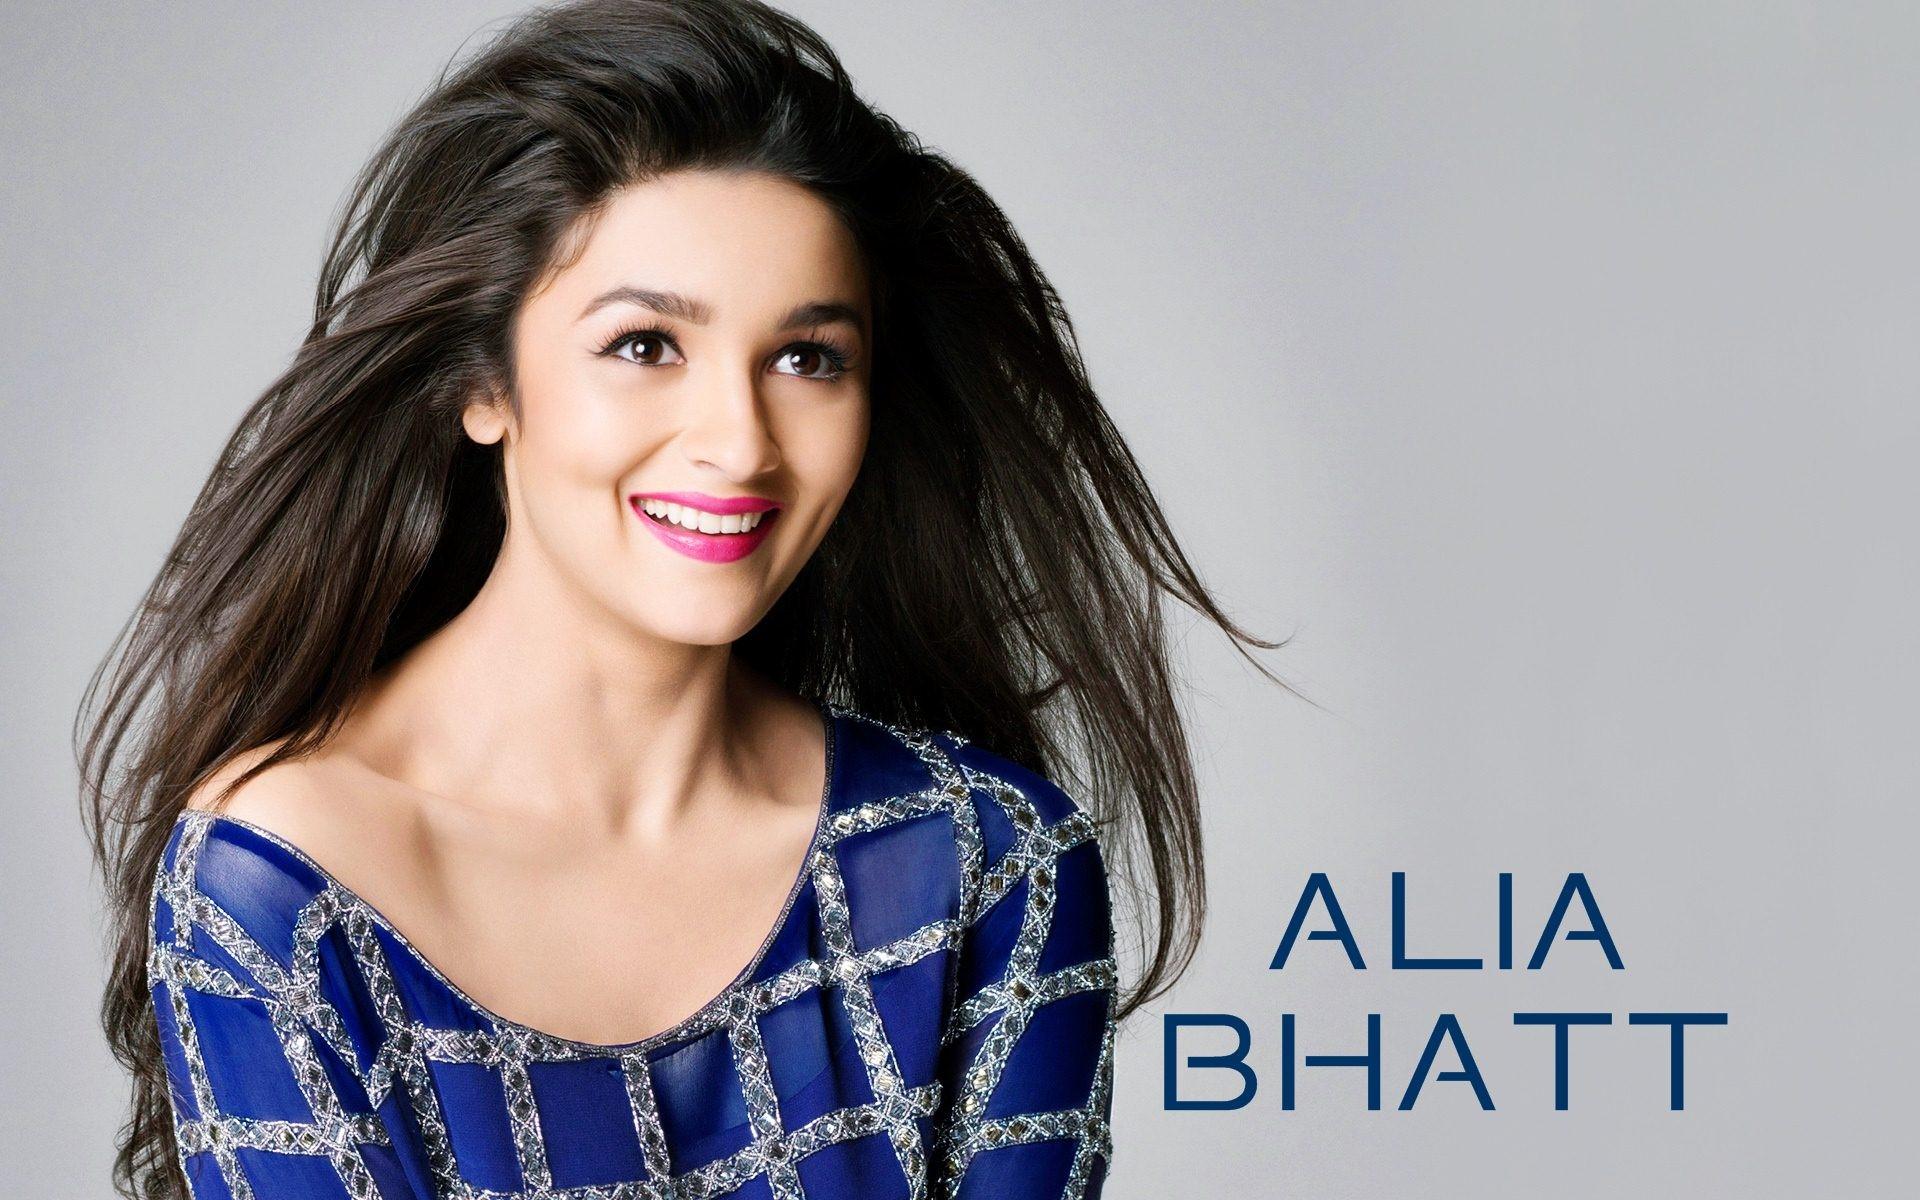 Alia Bhatt Photo: Alia Bhatt Wallpapers High Quality